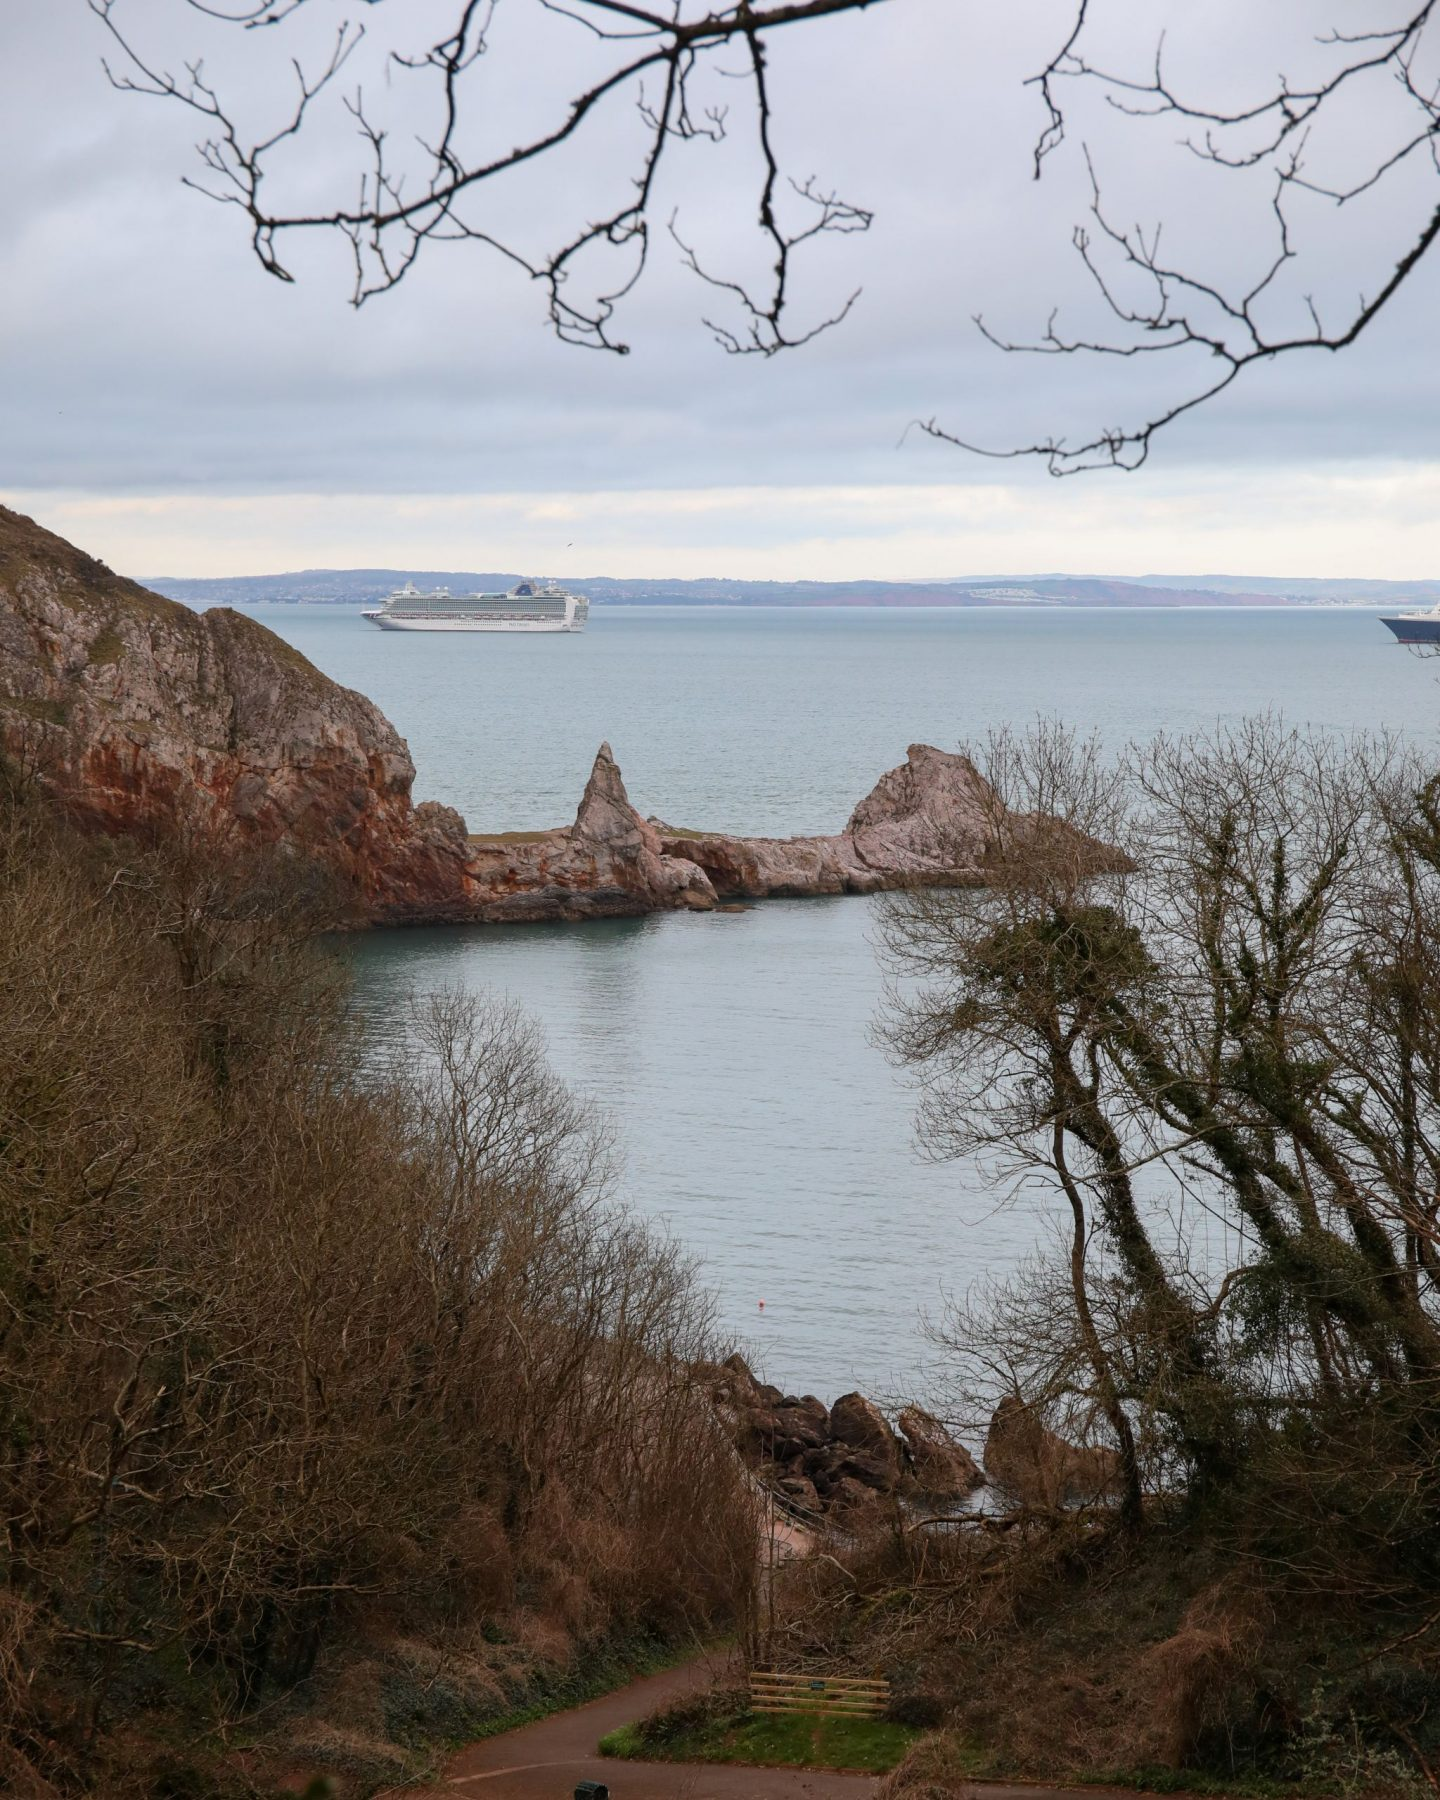 Ansteys Cove, Torquay, Devon, Katie Heath, KALANCHOE